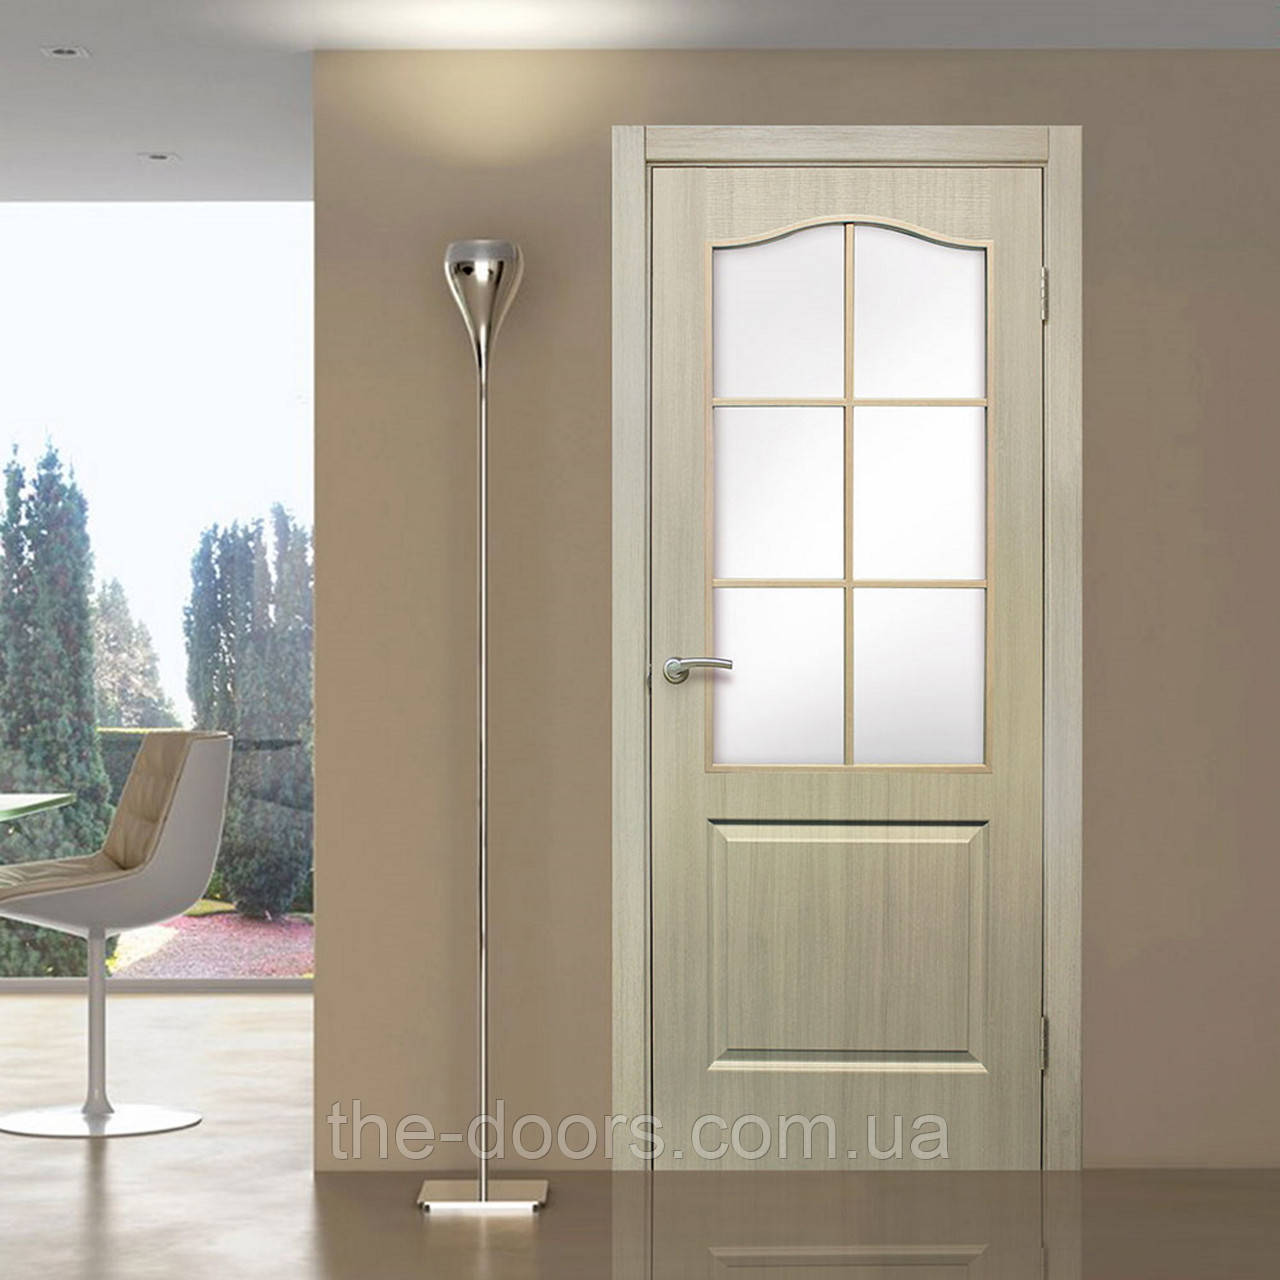 Двери межкомнатные Классика стекло сатин